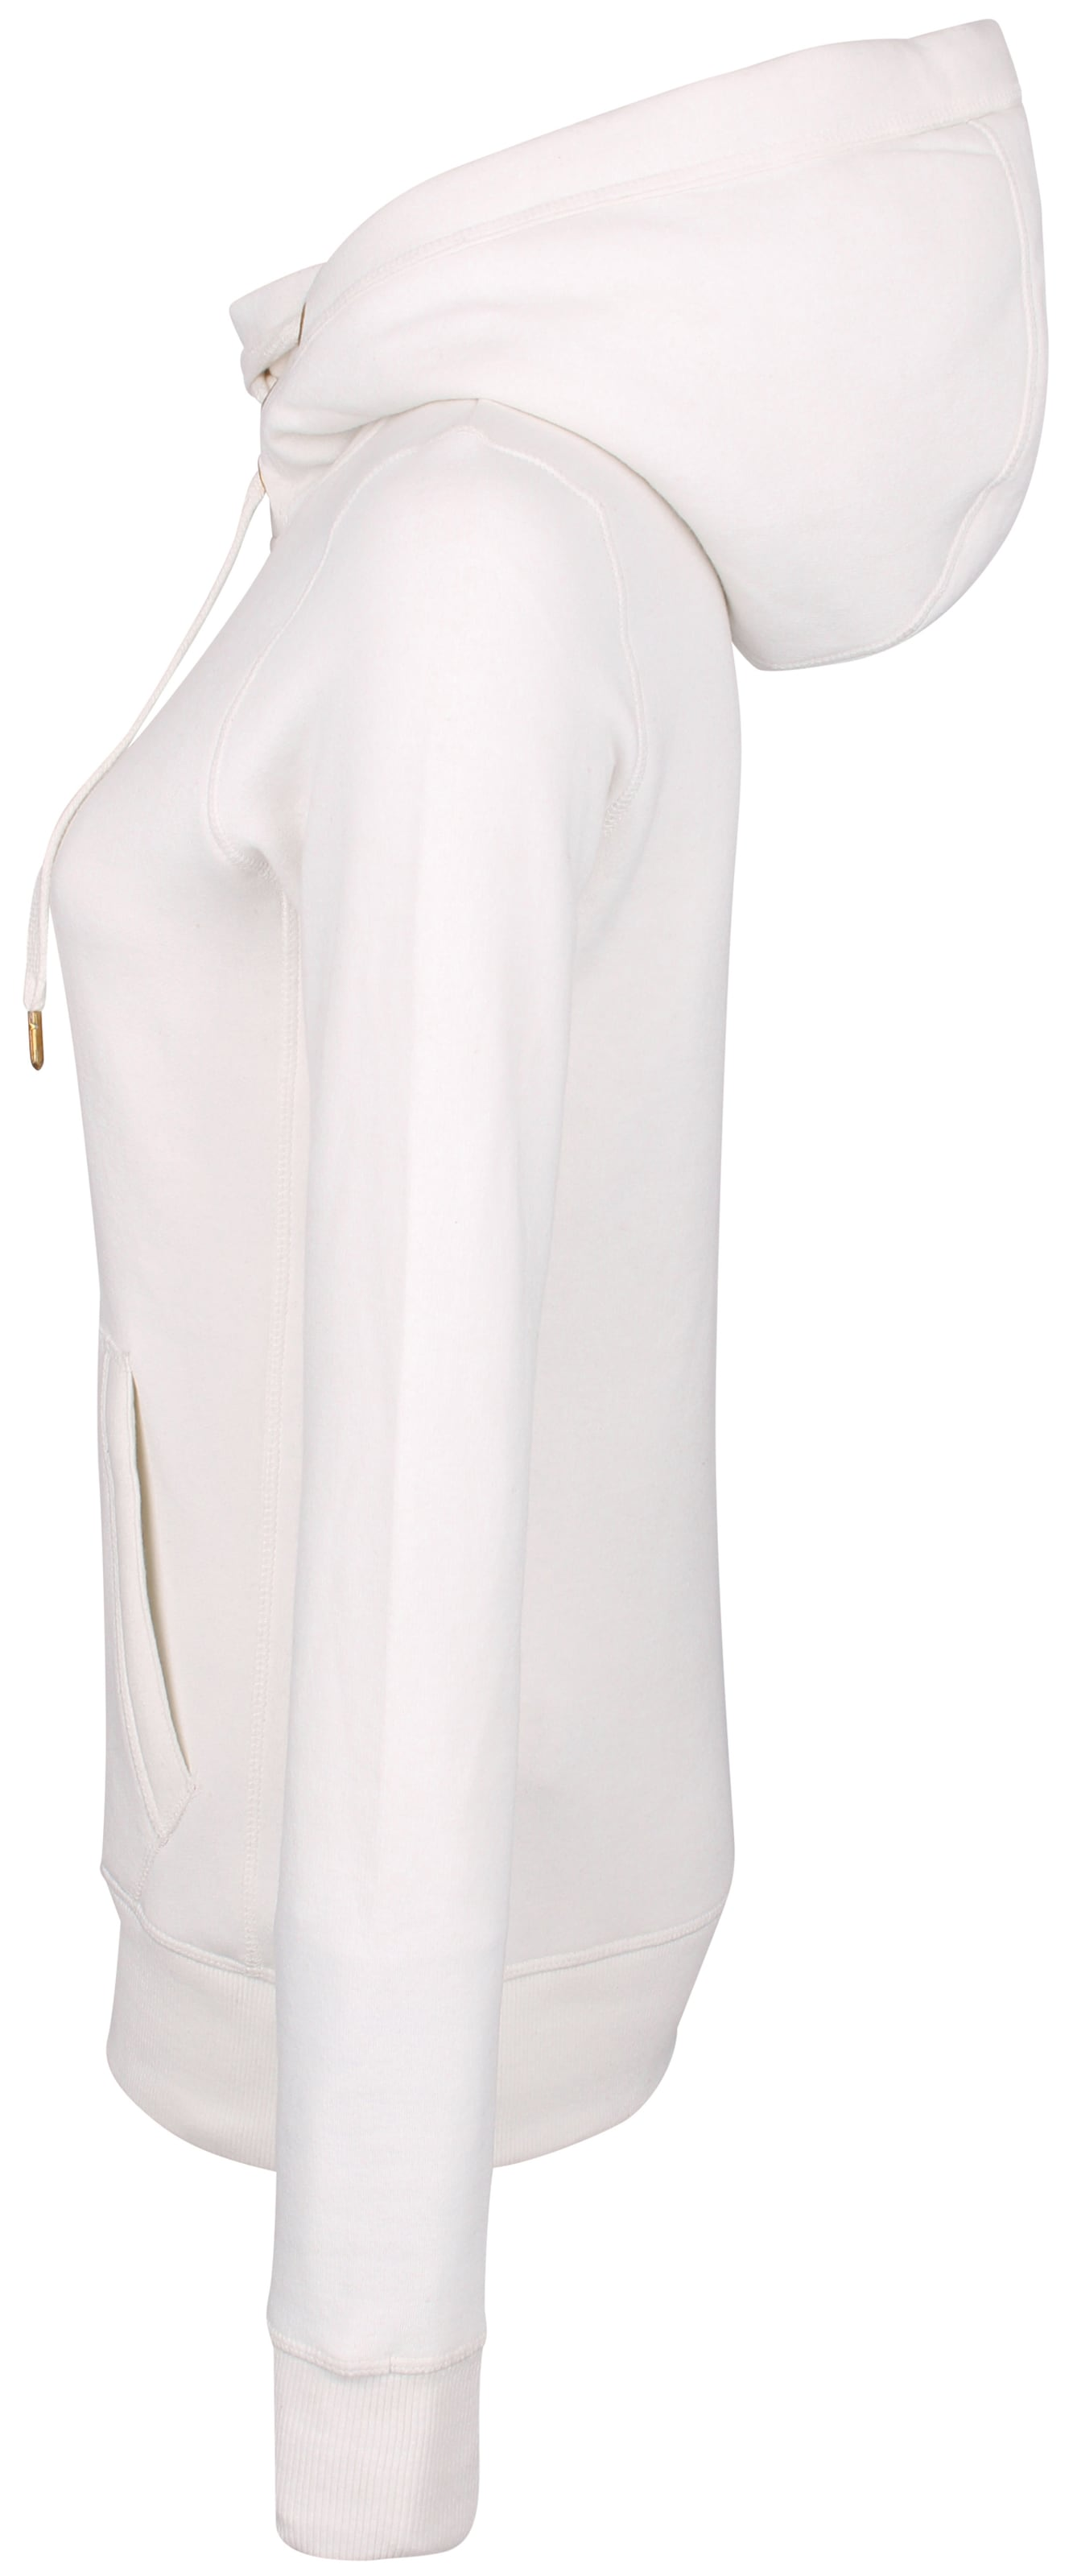 En shirt Sweat shirt Mymo Blanc Mymo En Sweat Blanc qVLGSUpzM